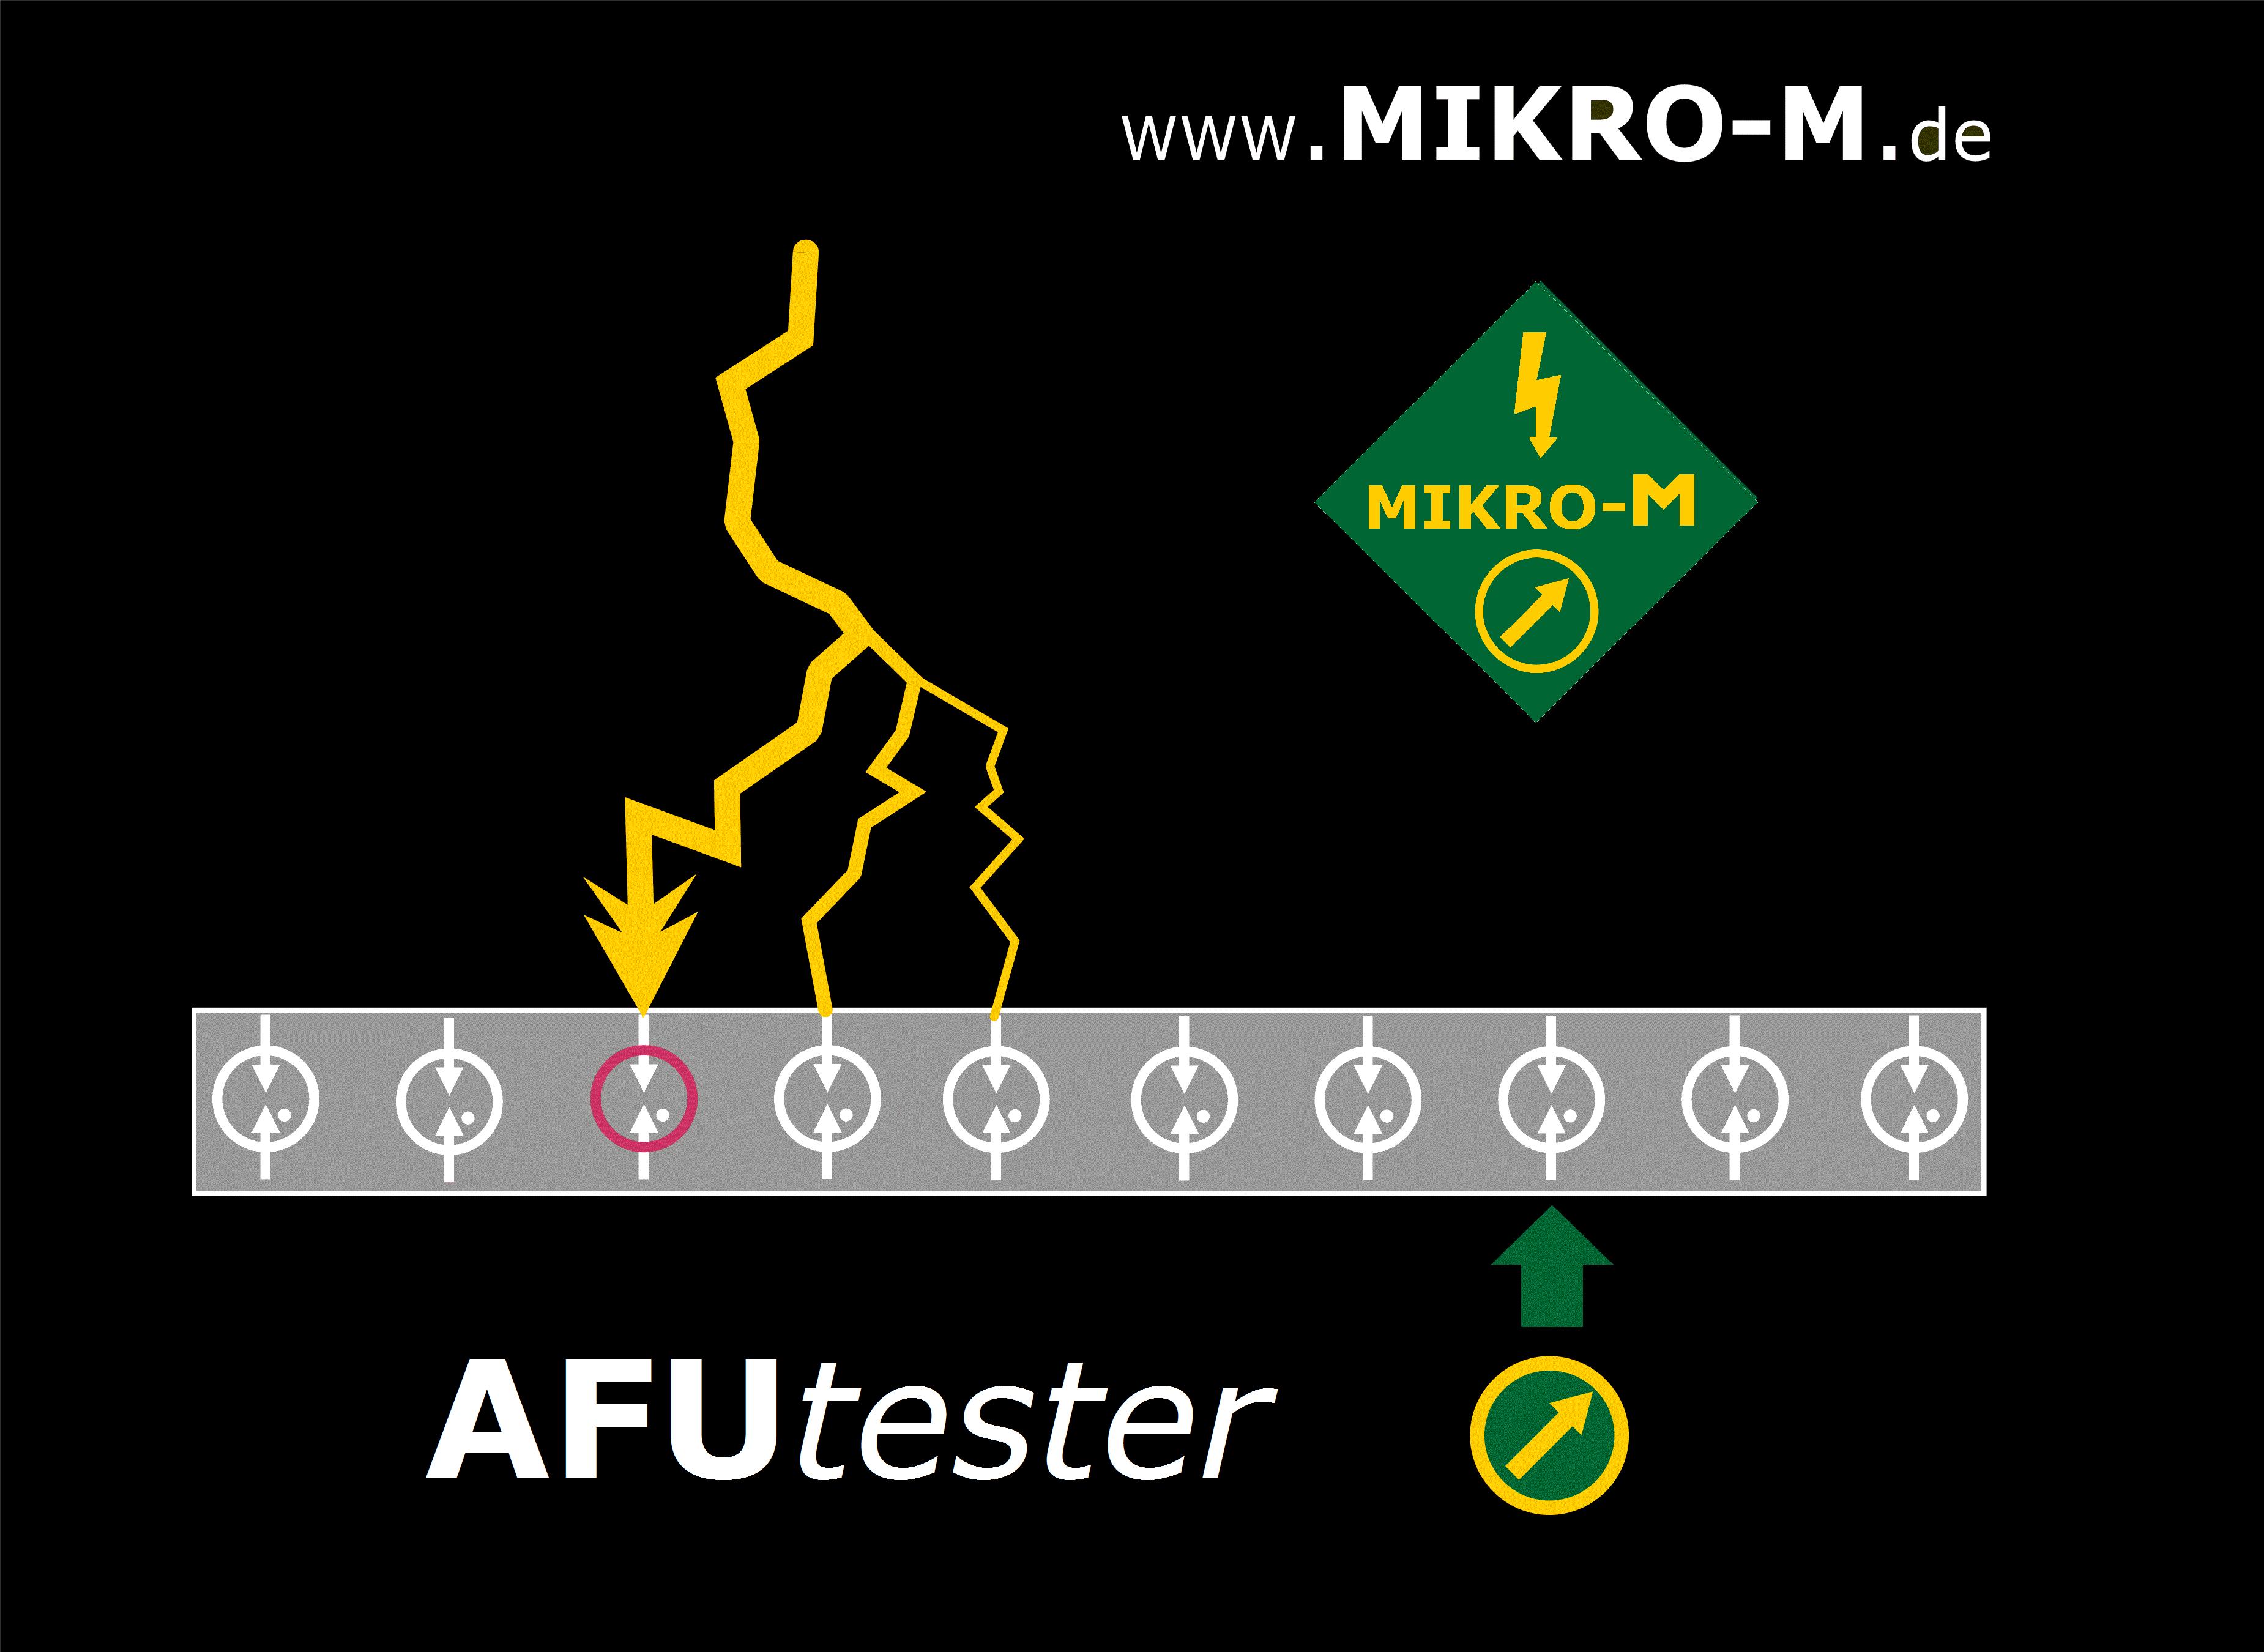 MIKRO-M - AFUtester